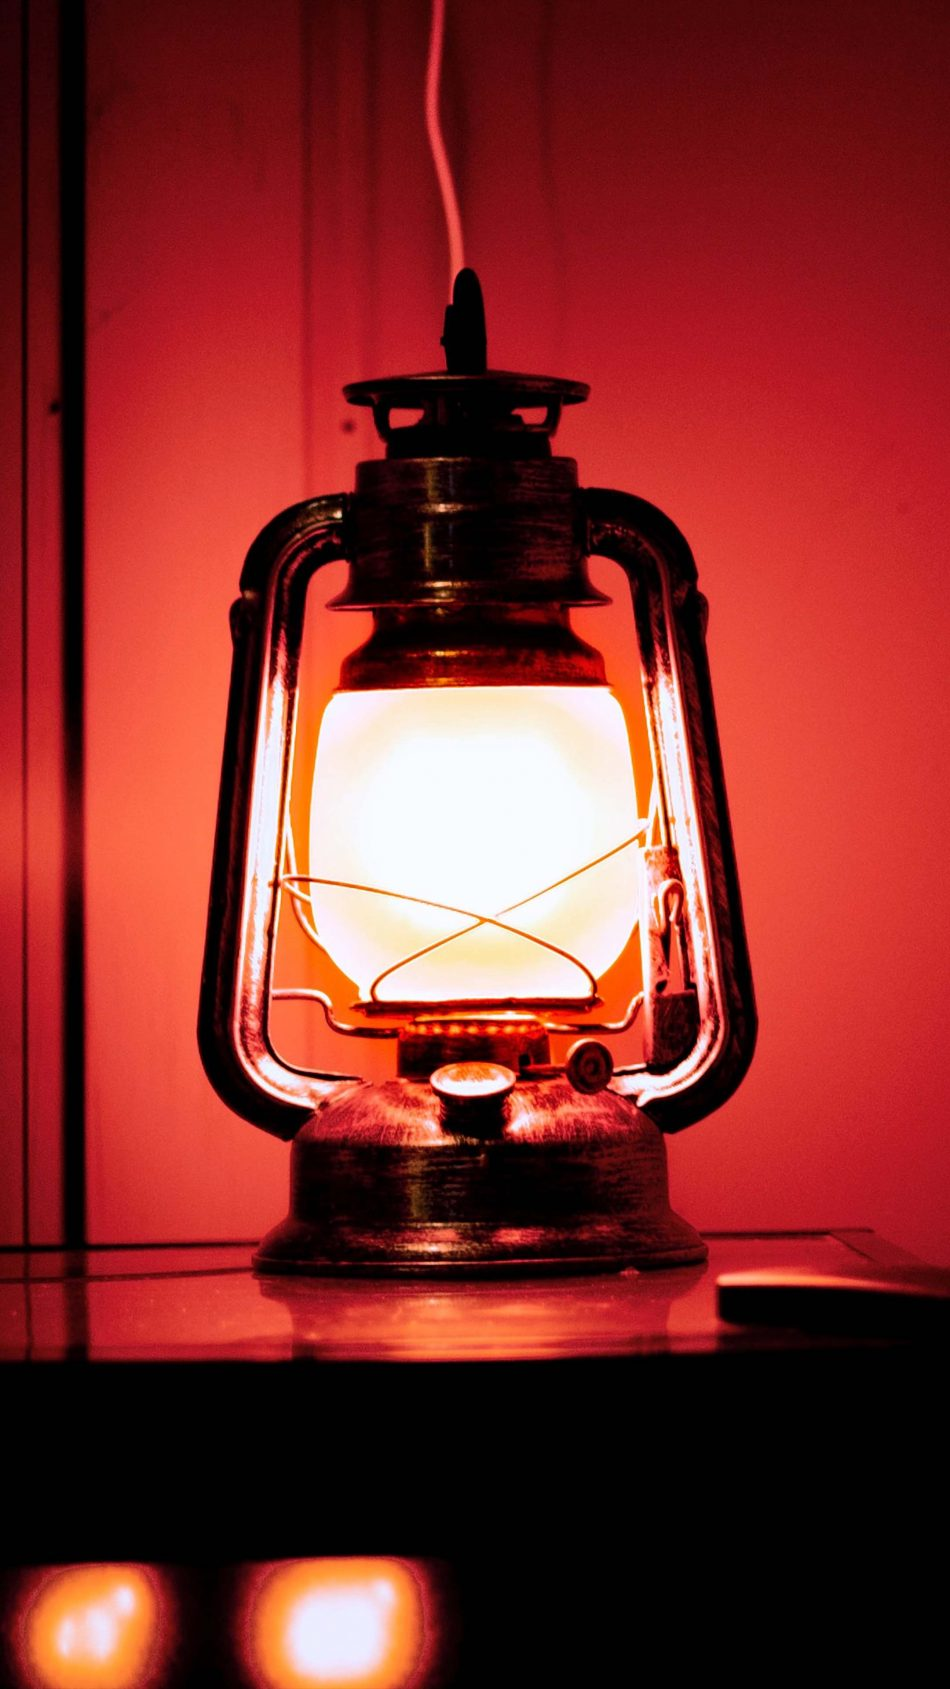 Lantern Red Light Dark 4K Ultra HD Mobile Wallpaper